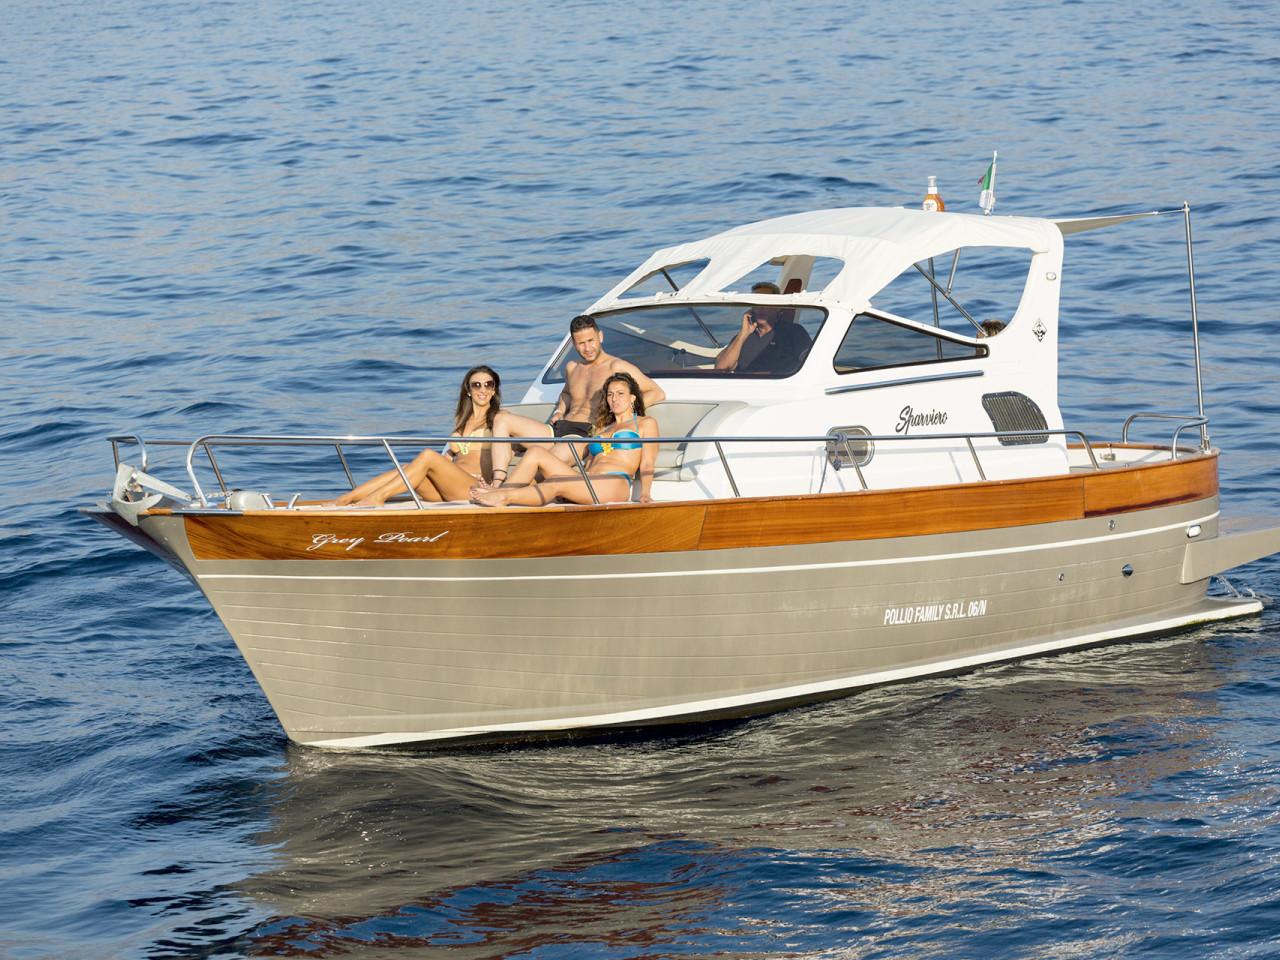 SPARVIERO 850 GREY PEARL | Mar Amar boat tour Sorrento